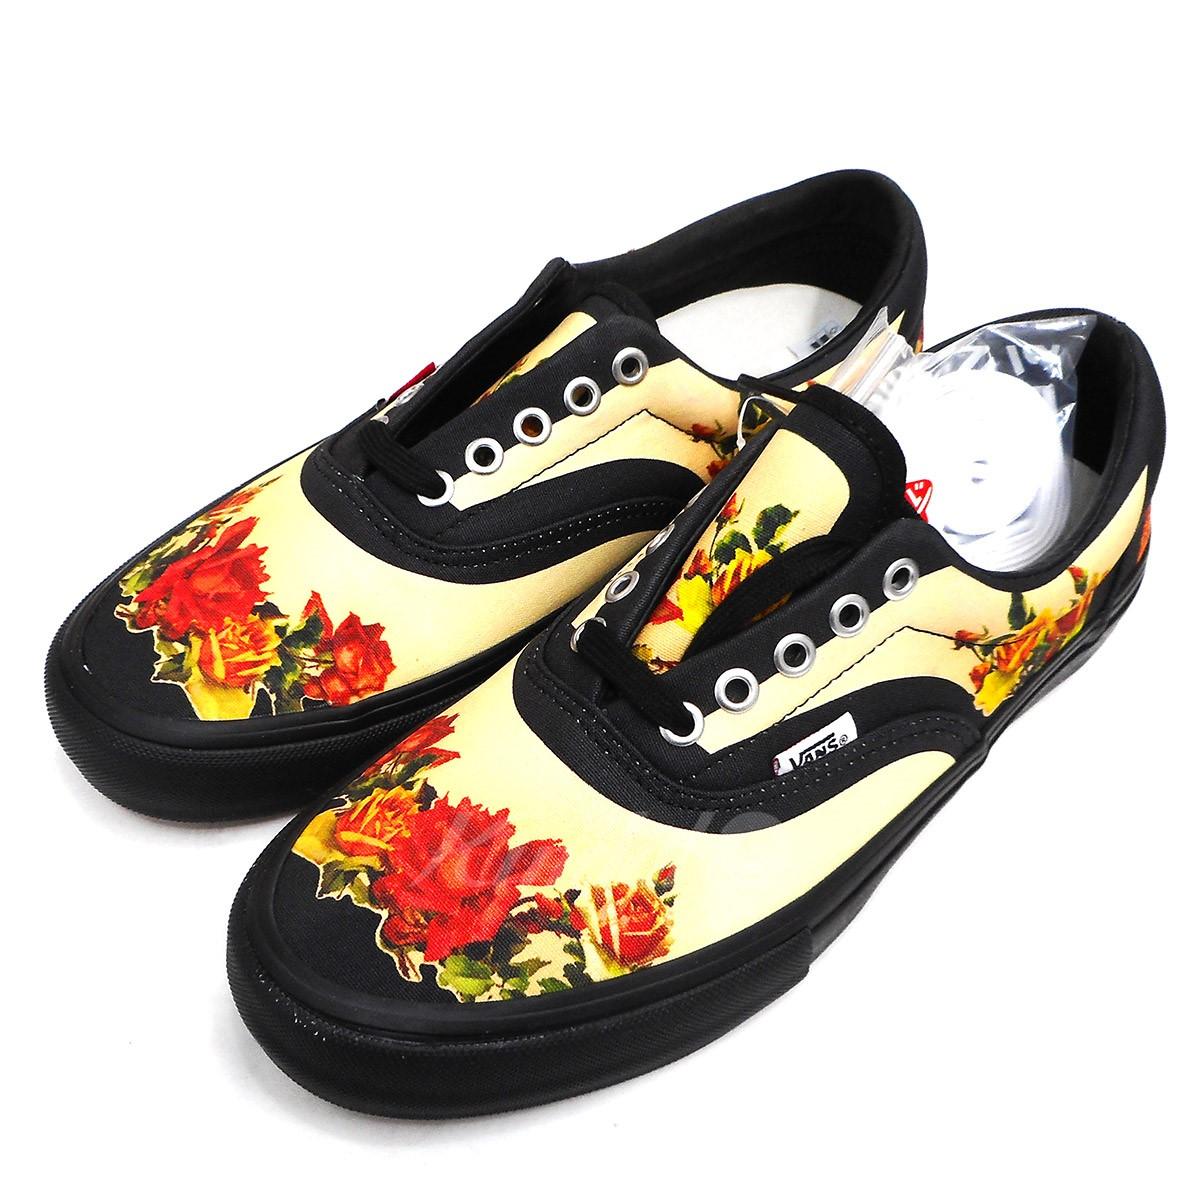 80bb48af436d Supreme X VANS X Jean Paul Gaultier 19SS Floral Prit Era Pro floral print  gills sneakers black size  US9